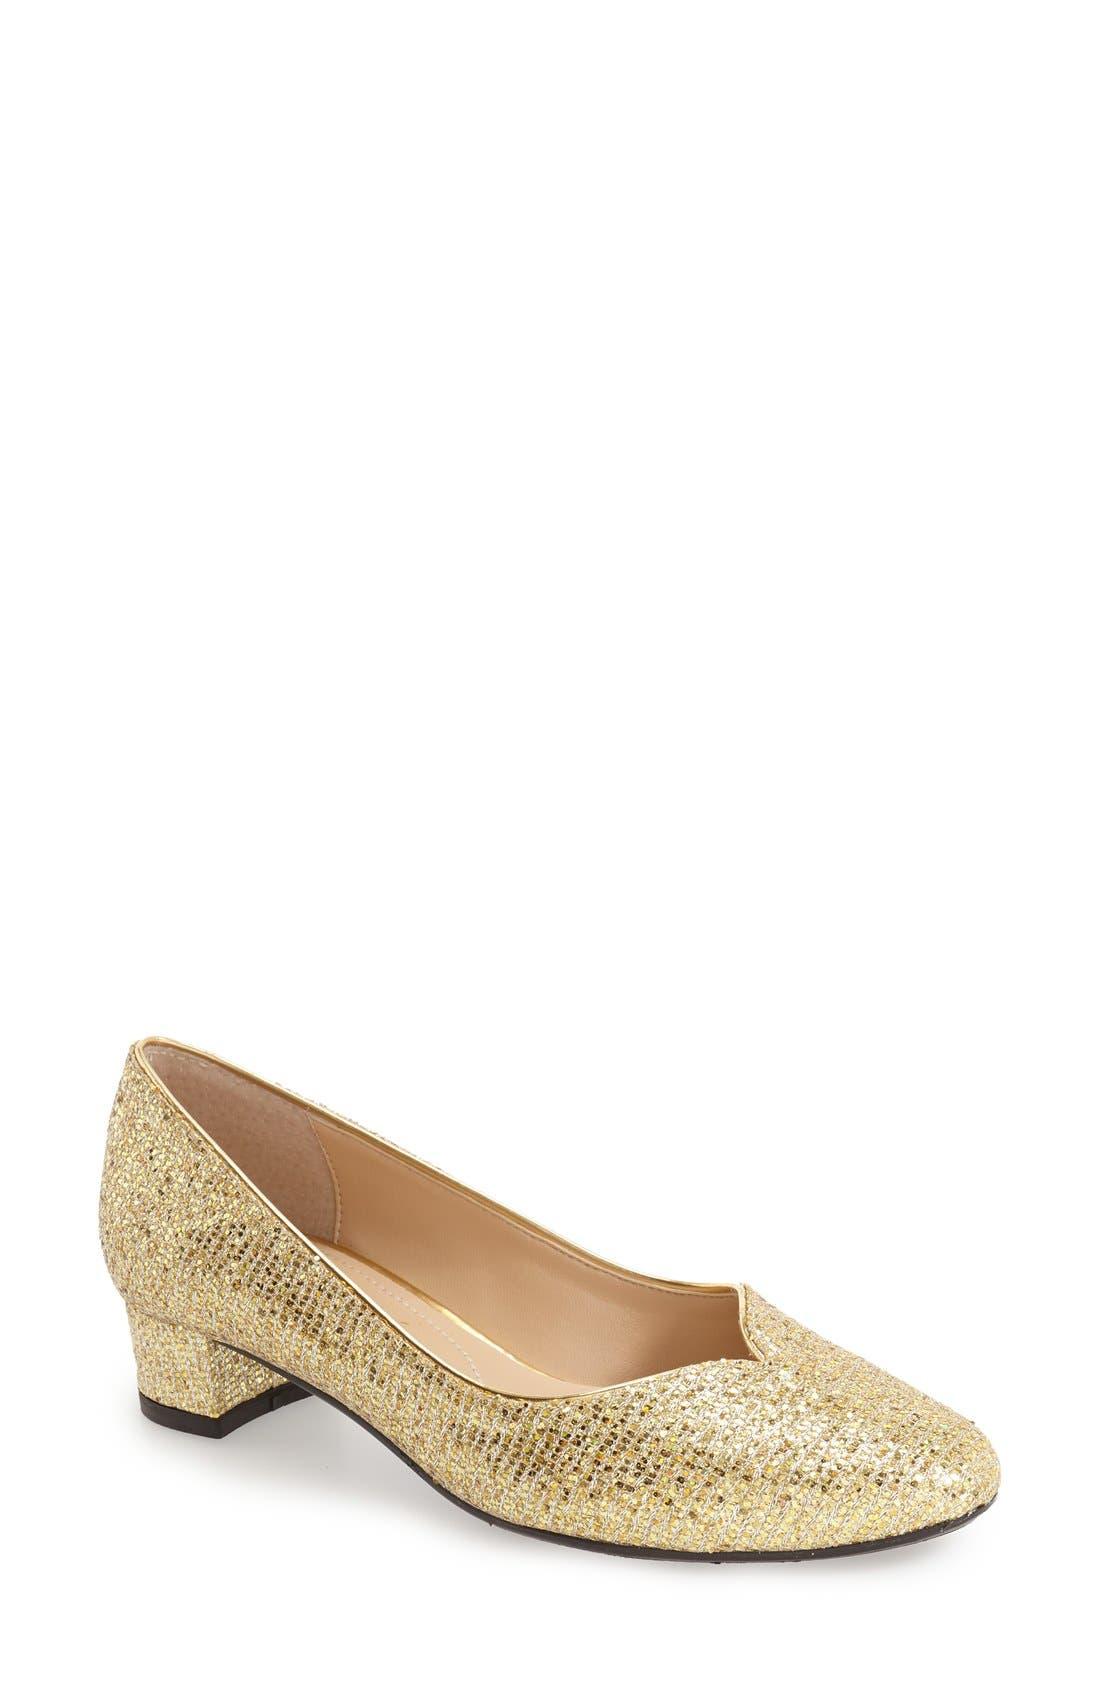 'Bambalina' Block Heel Glitter Pump,                             Main thumbnail 1, color,                             Gold Glitter Fabric